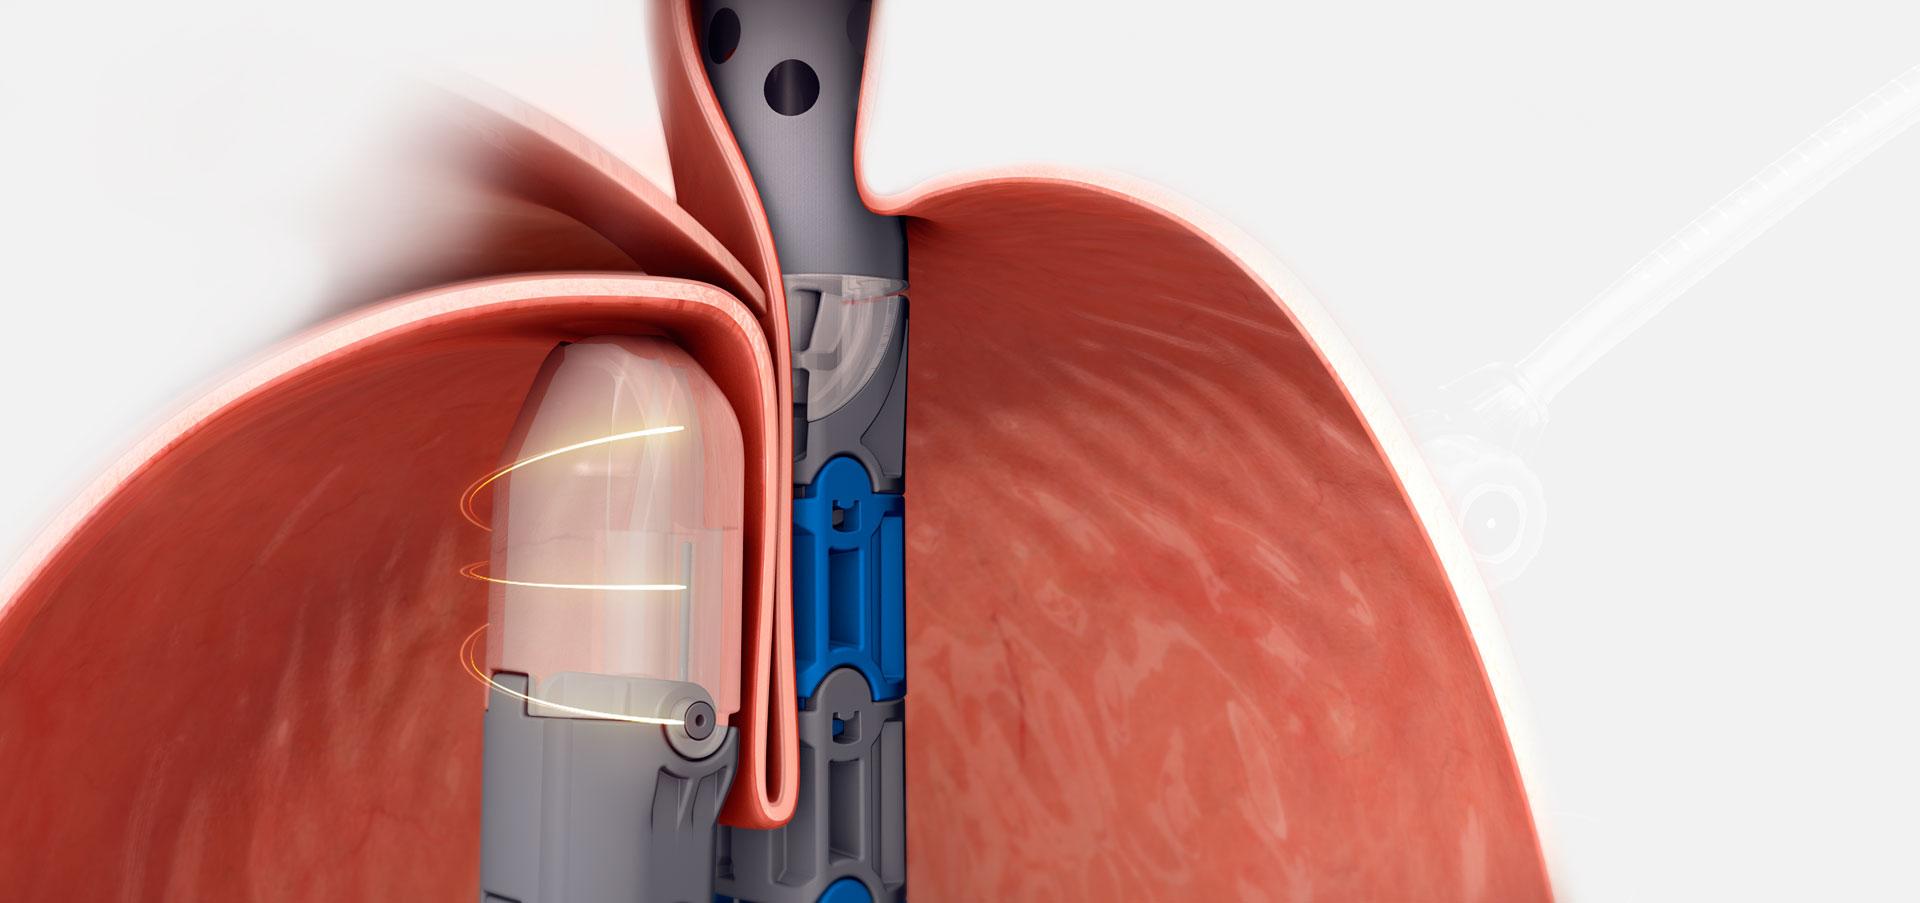 Picture of the TIF procedure to treat GERD